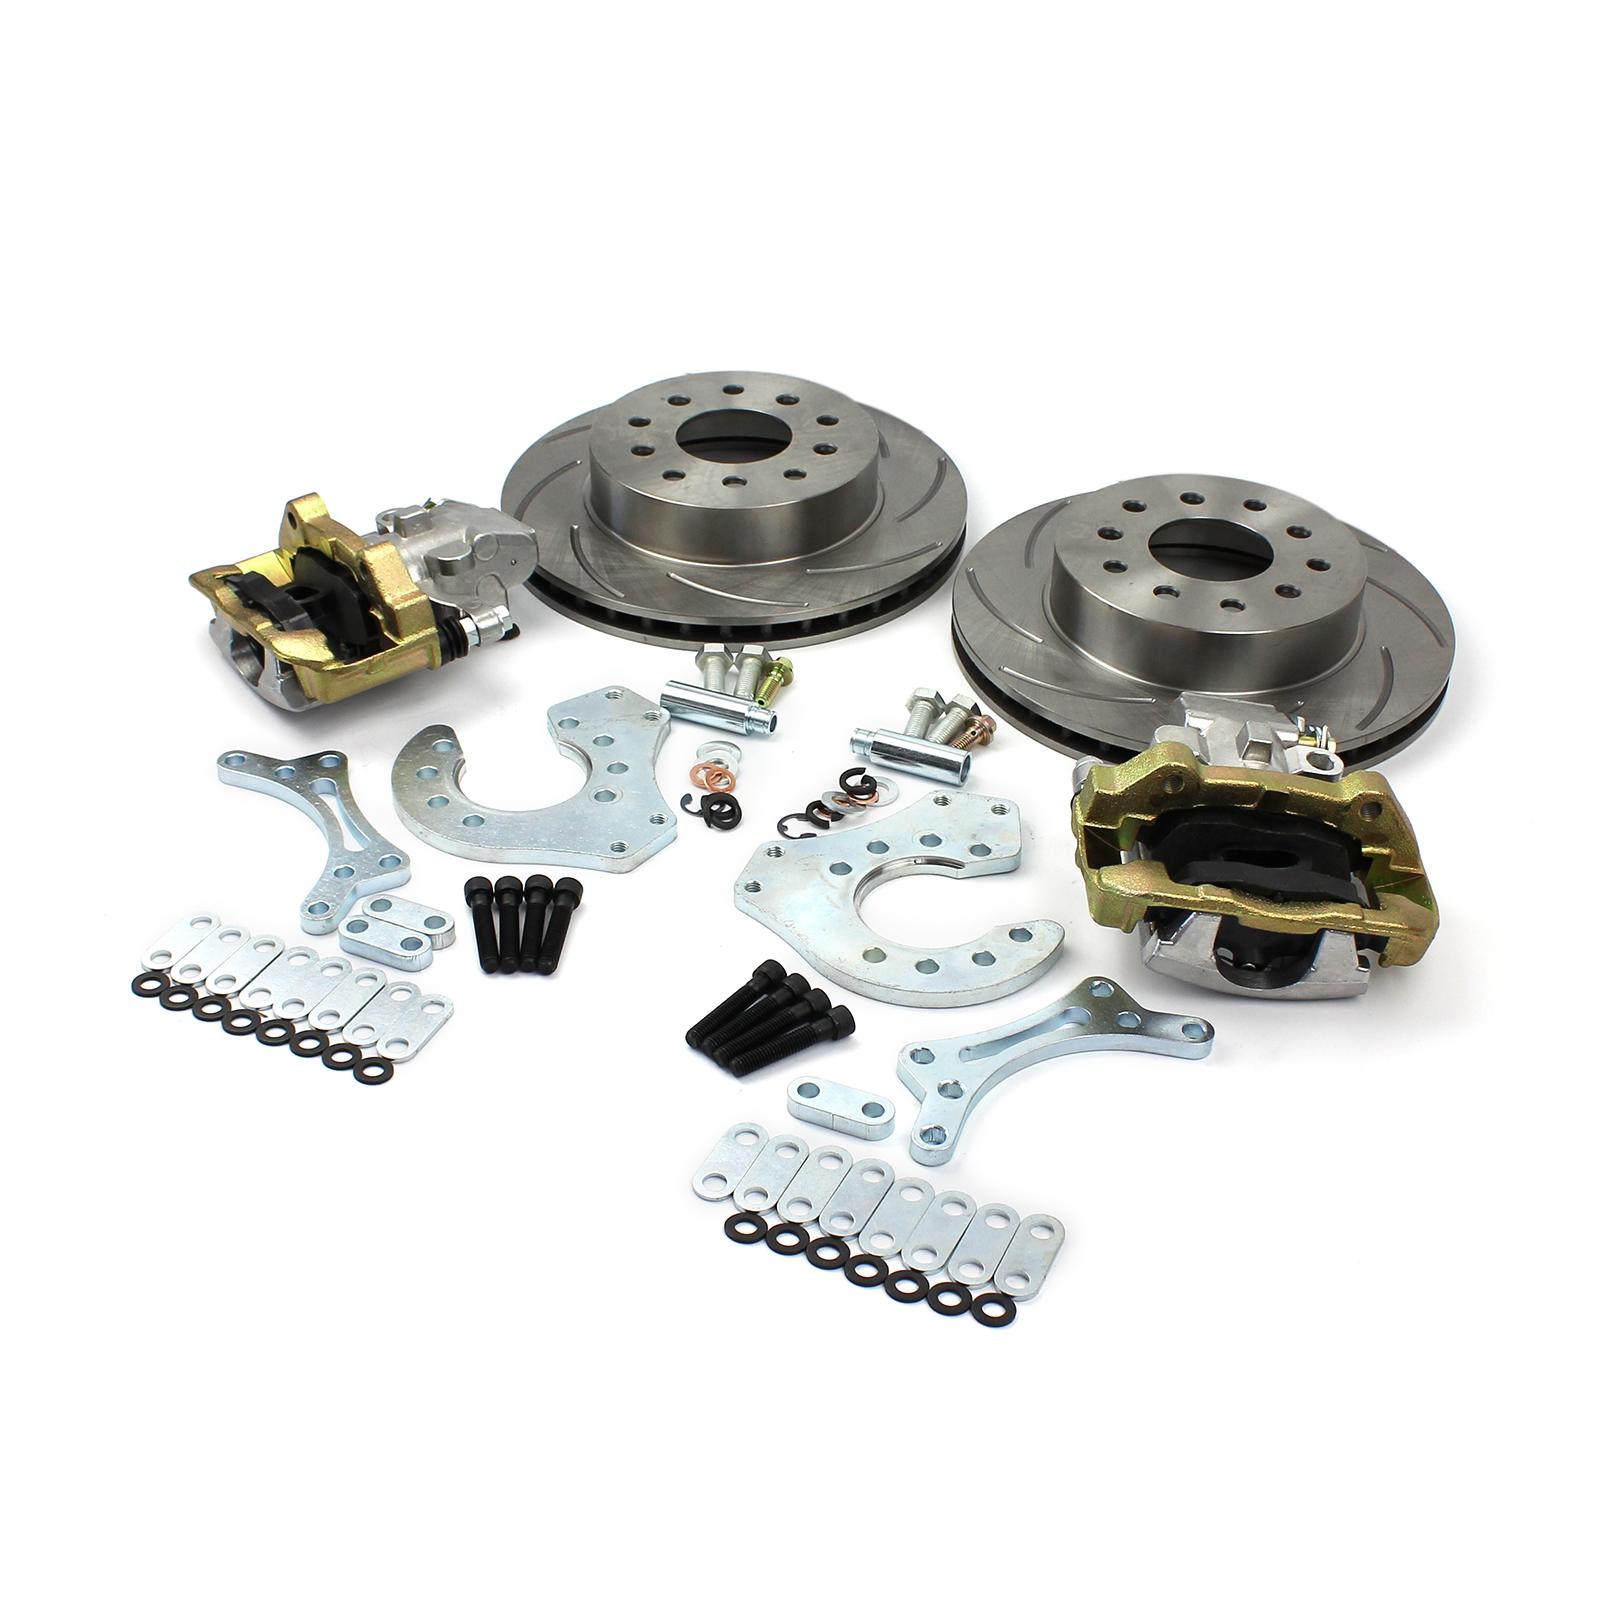 "Brake Kit For Most 15"" Aftermarket Wheels w/Built In E-Brake"